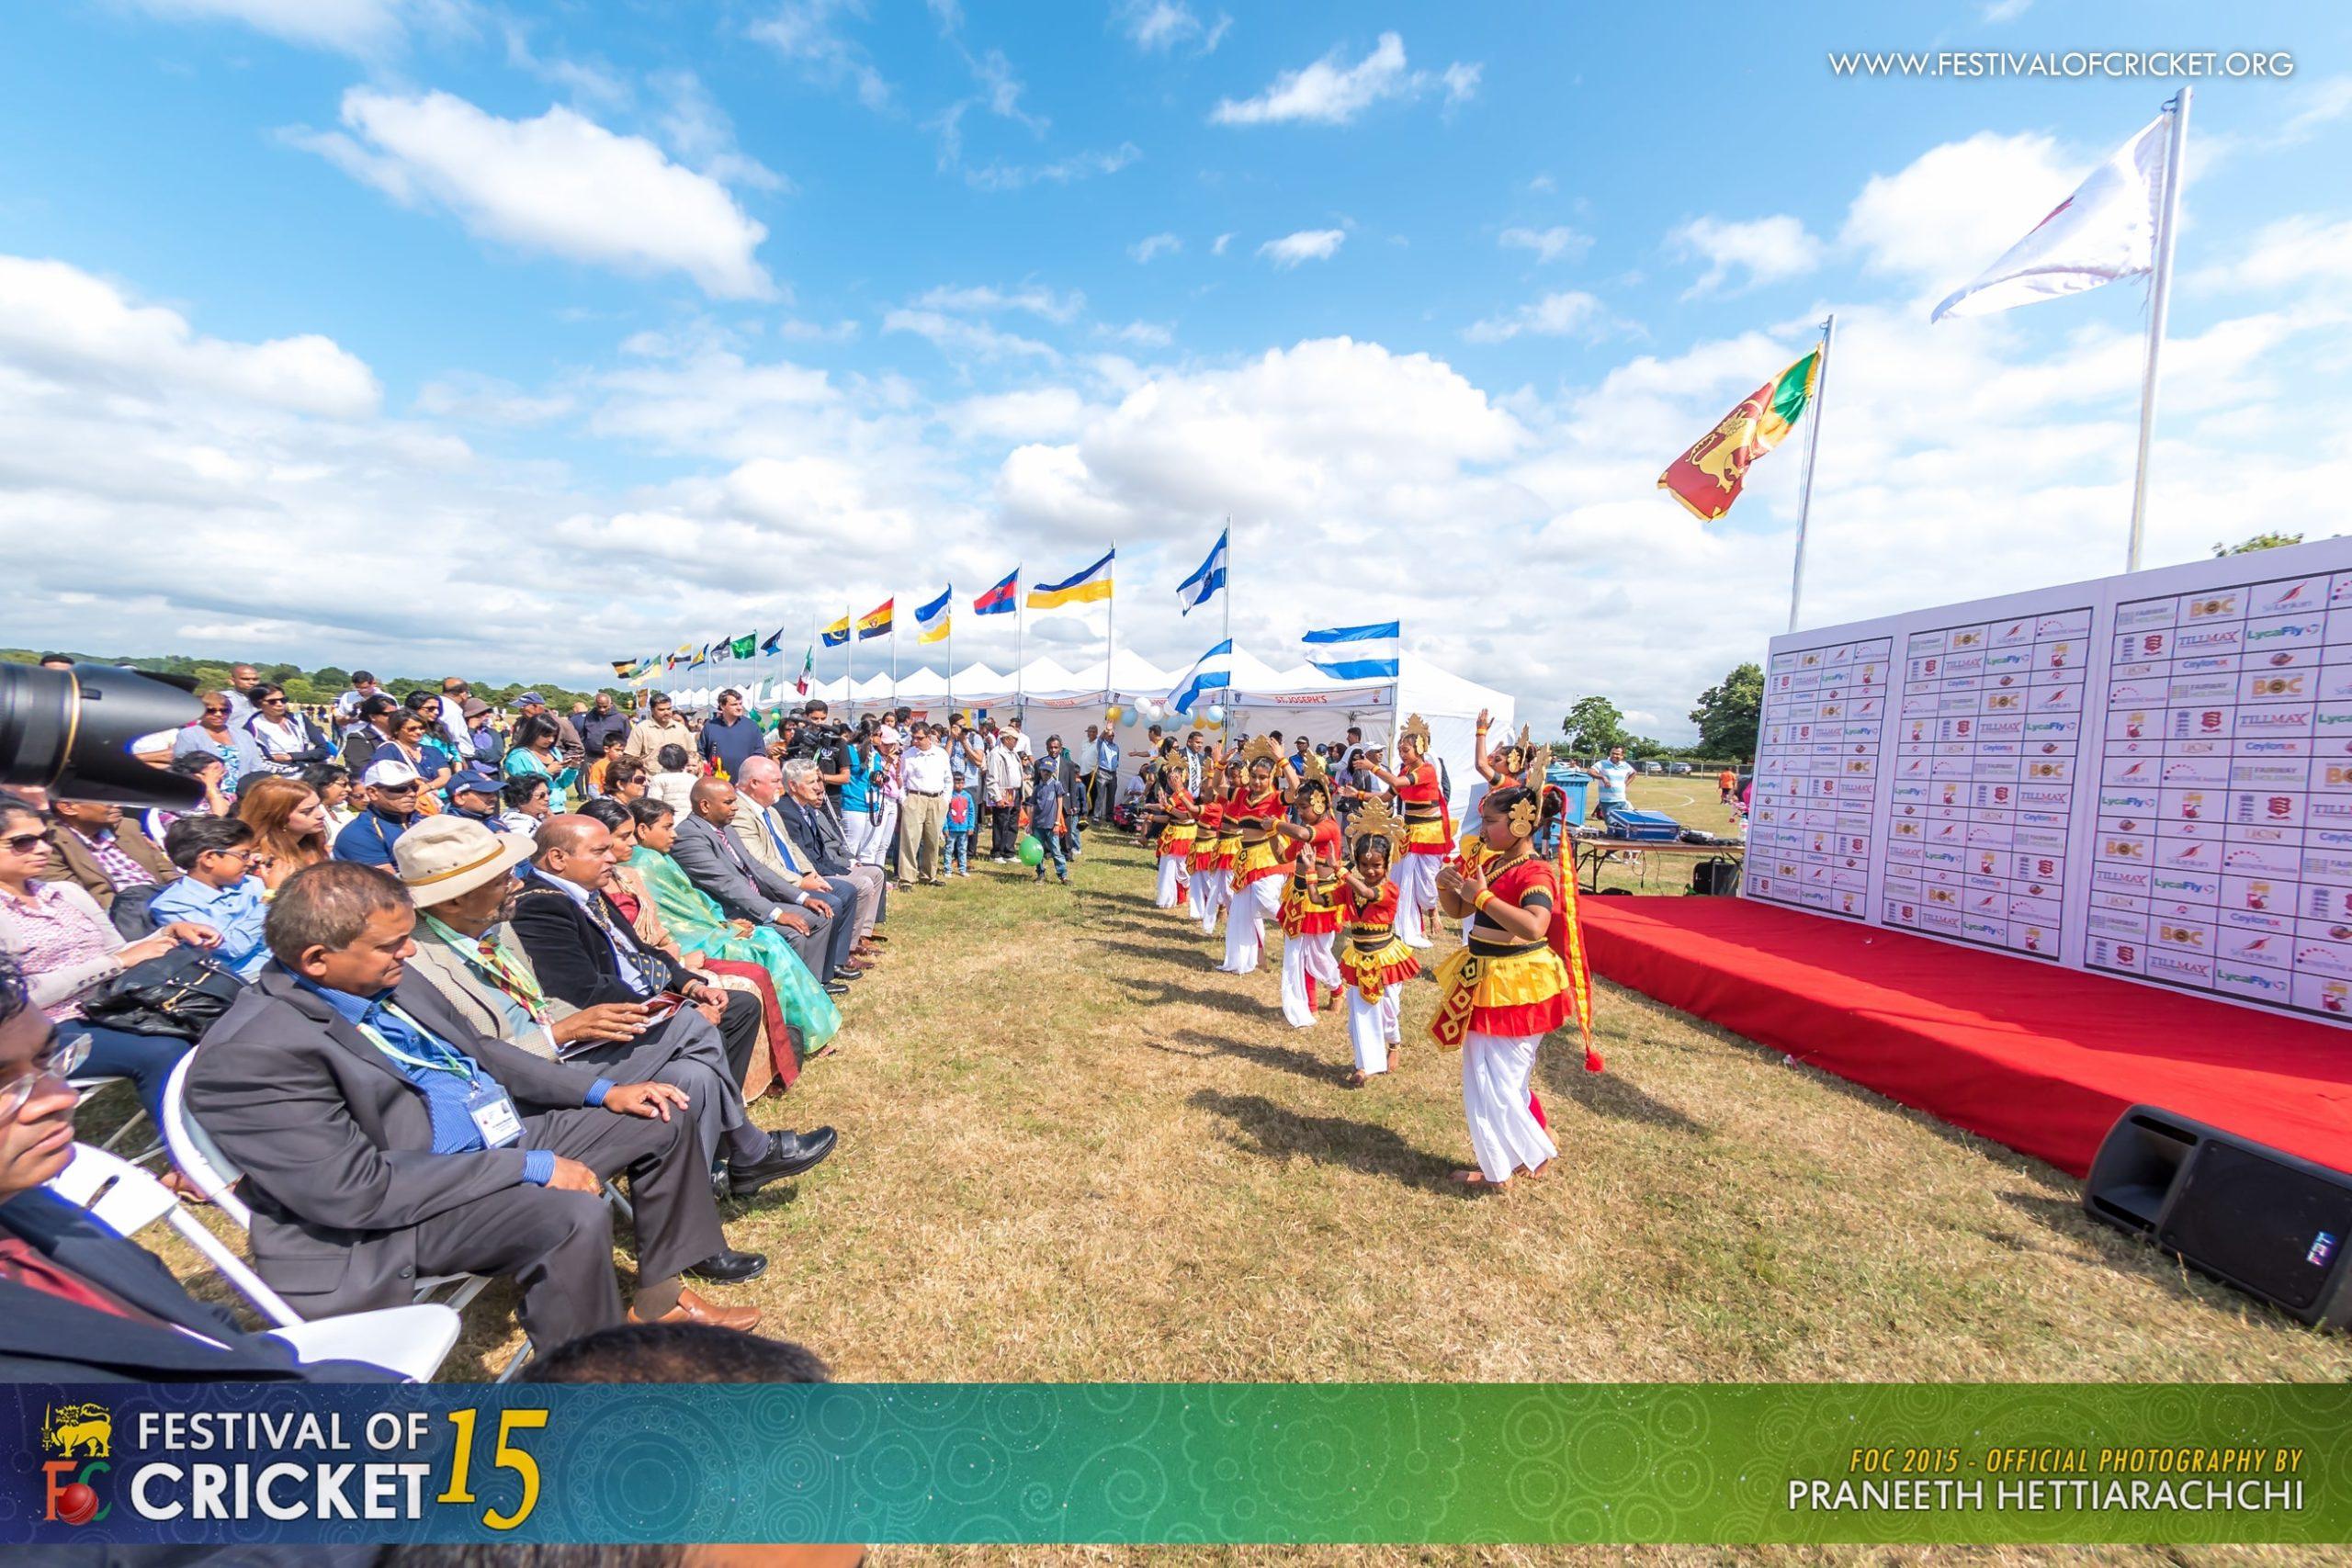 Festival of Cricket 2015